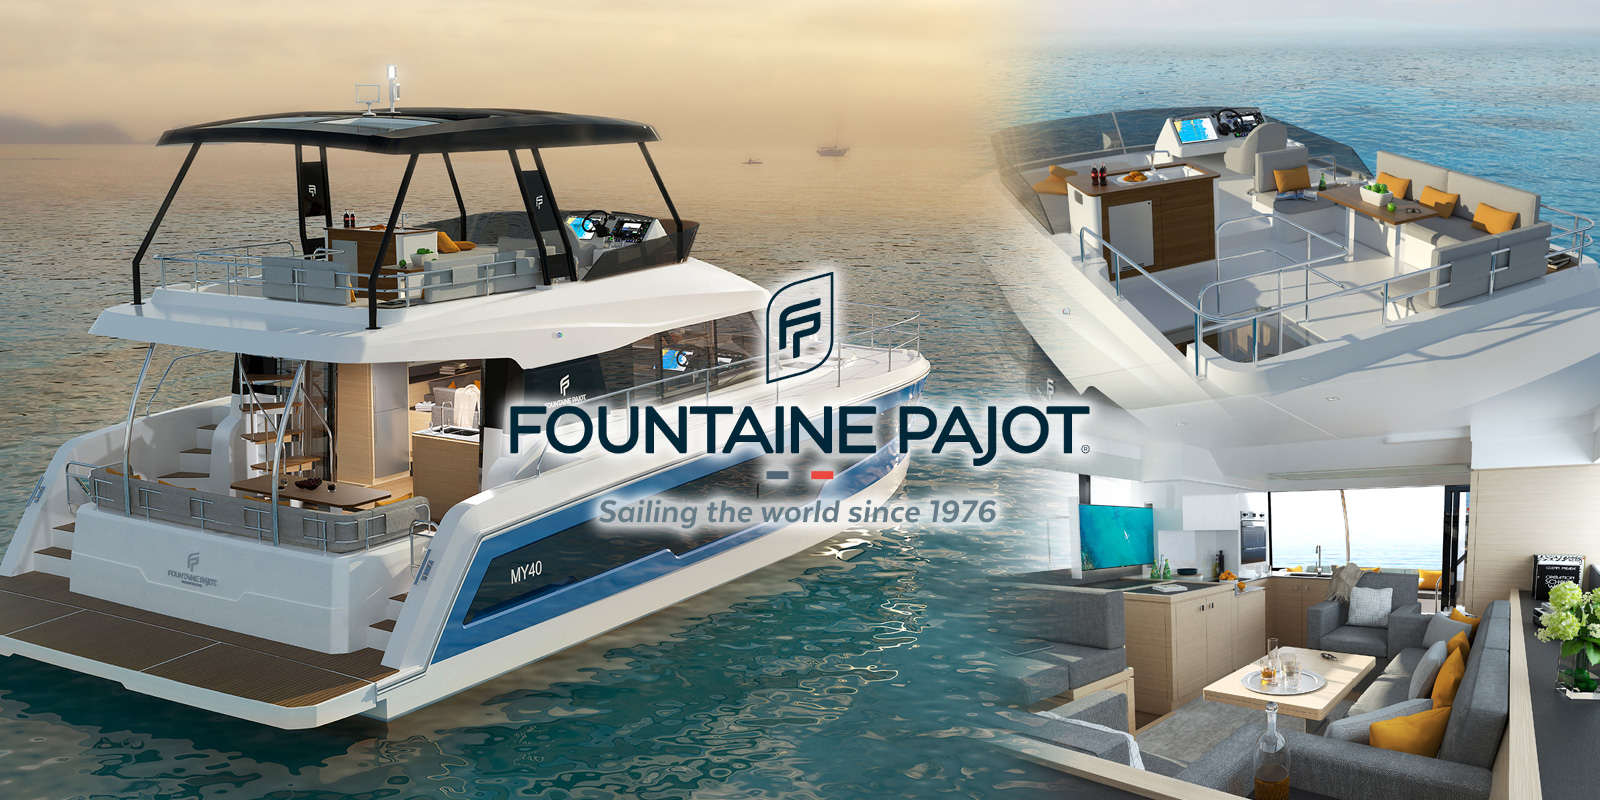 fountaine-pajot-MotorYachts